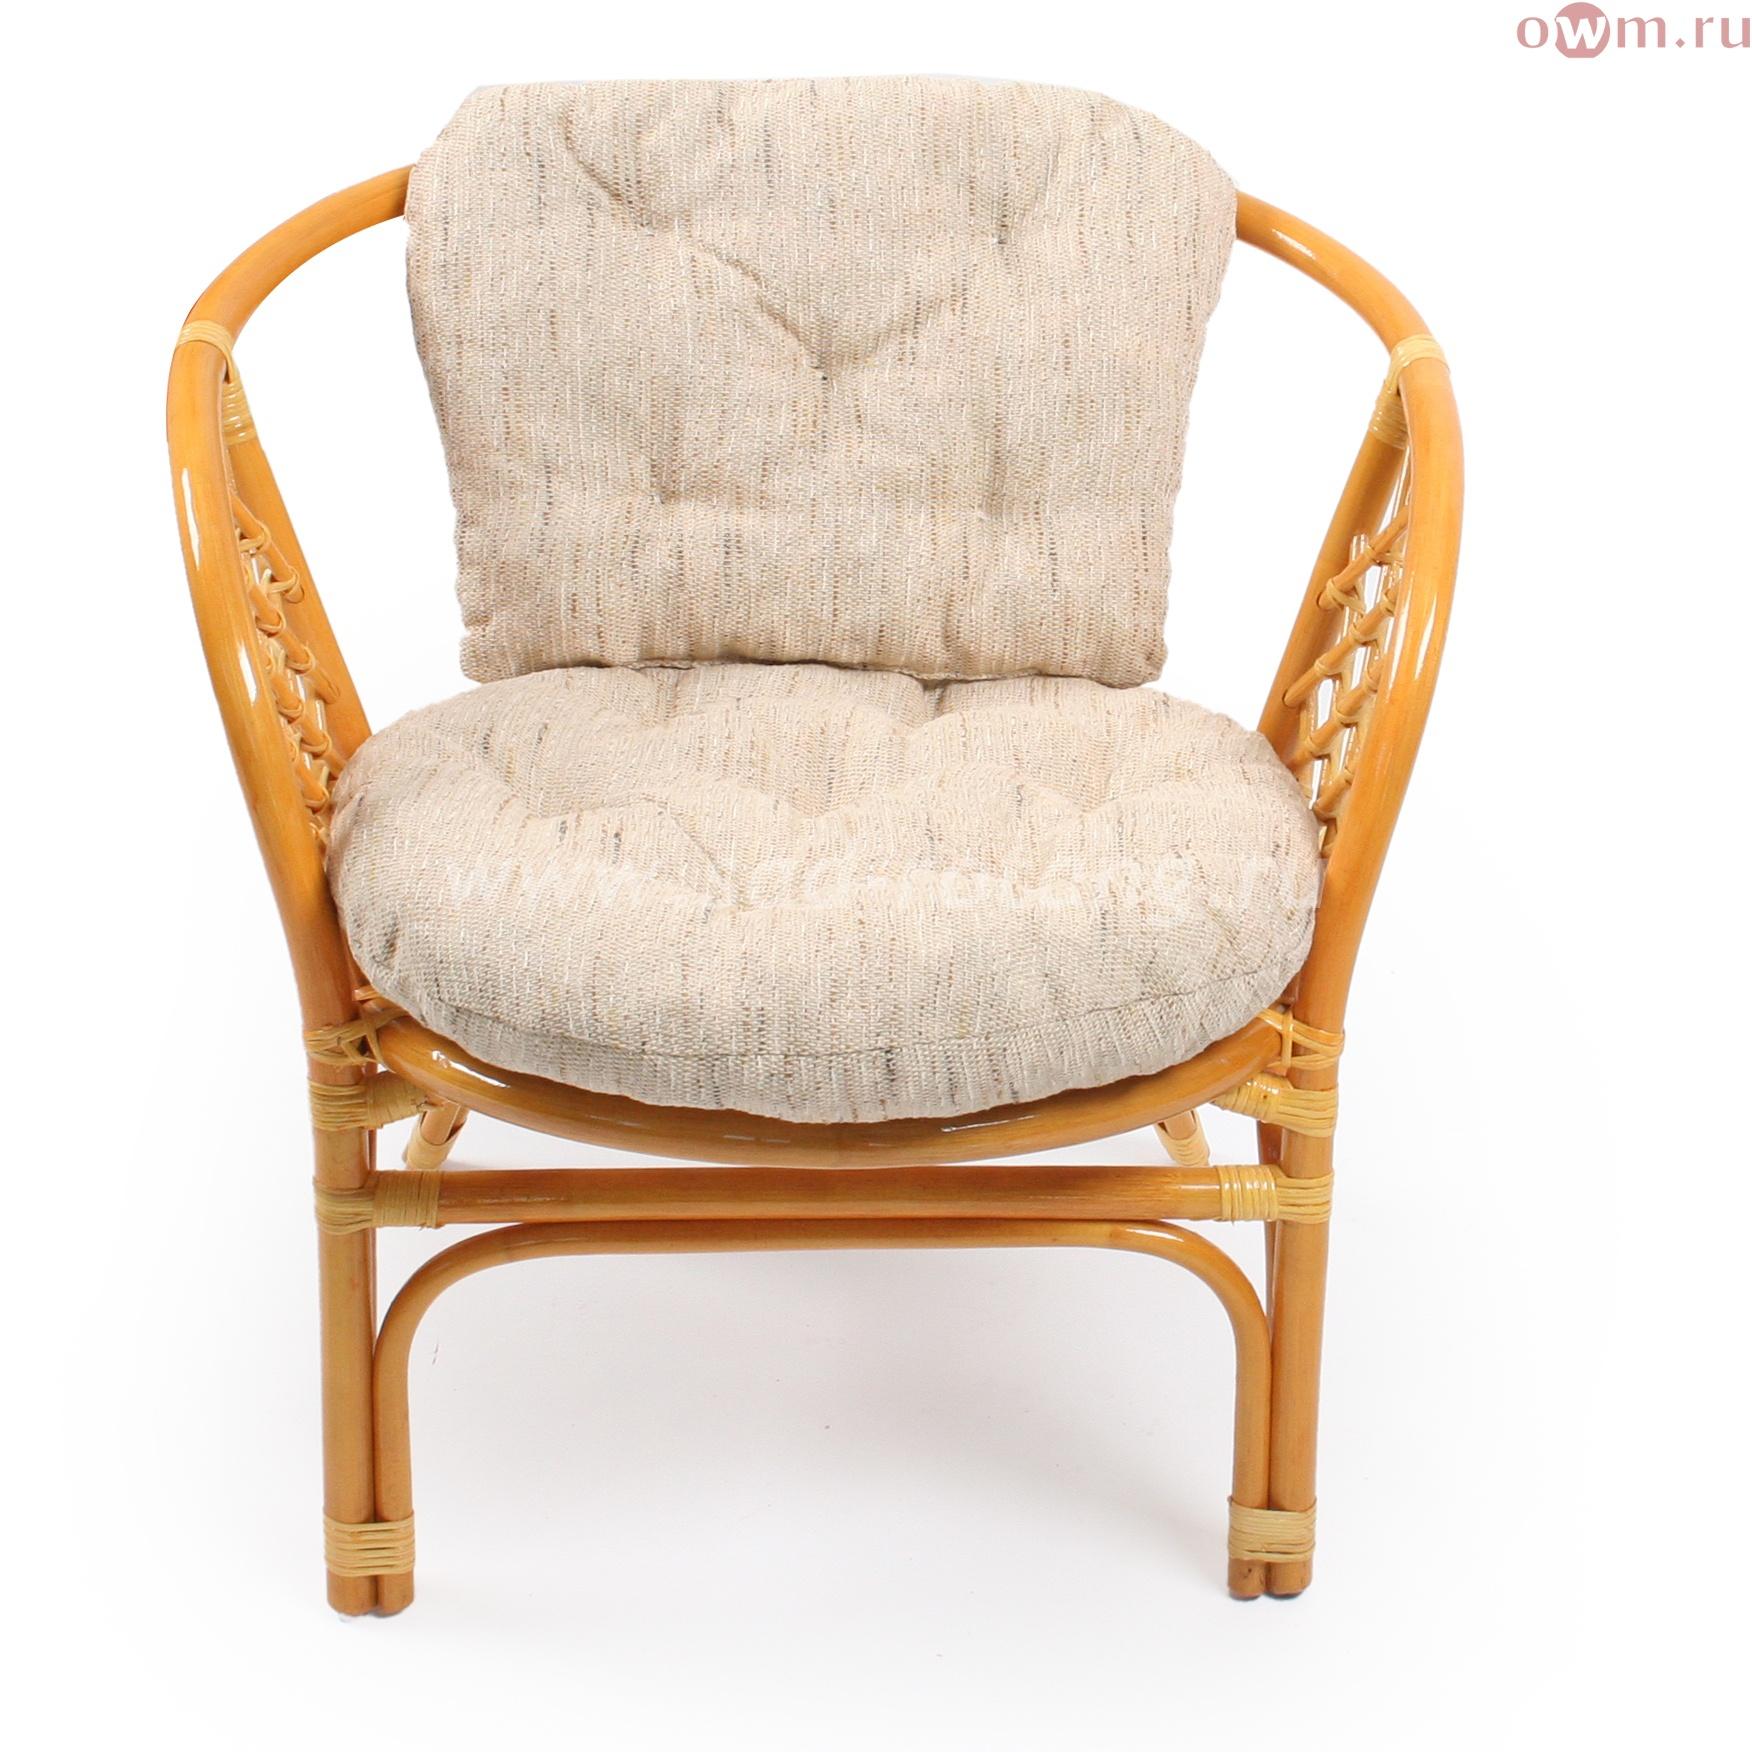 Кресло Багама (мёд) (Индонезия)